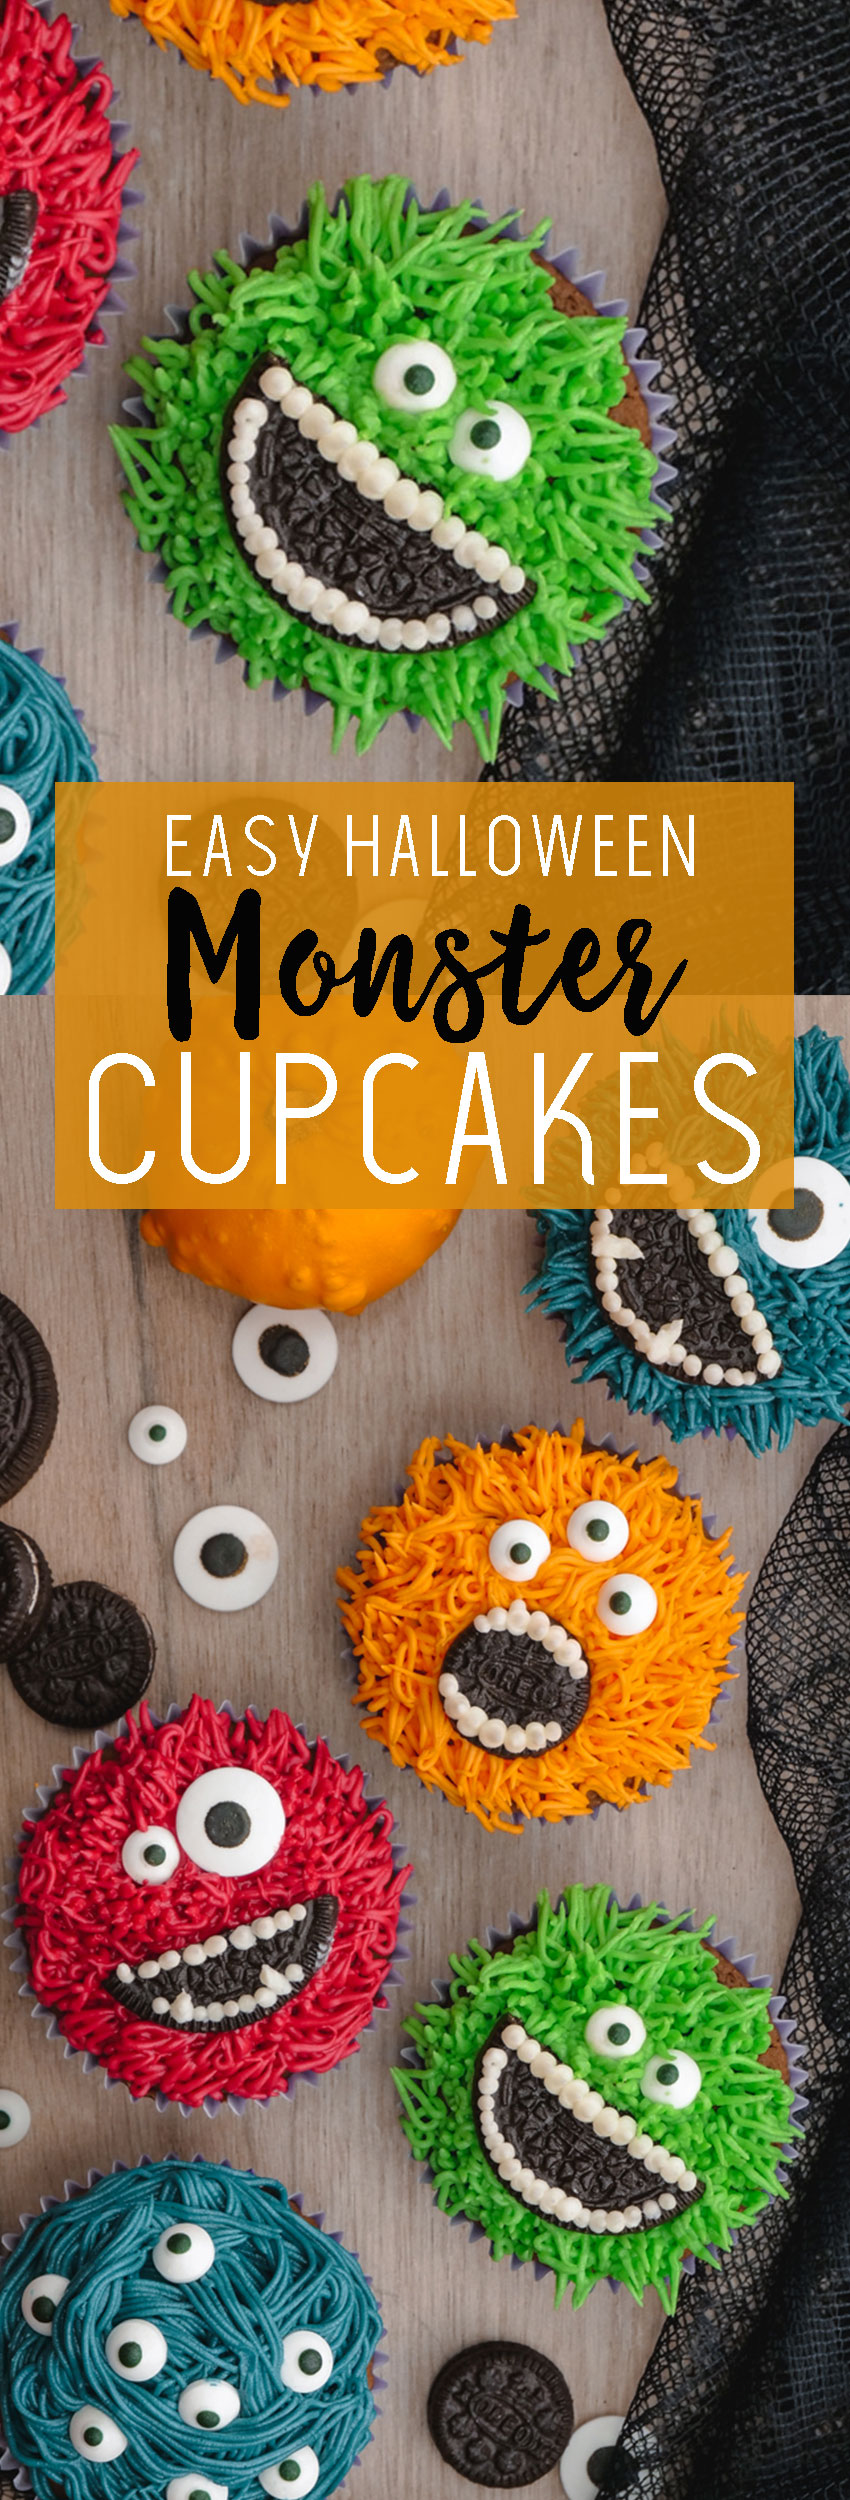 Easy Monster Cupcakes- Halloween cupcake ideas